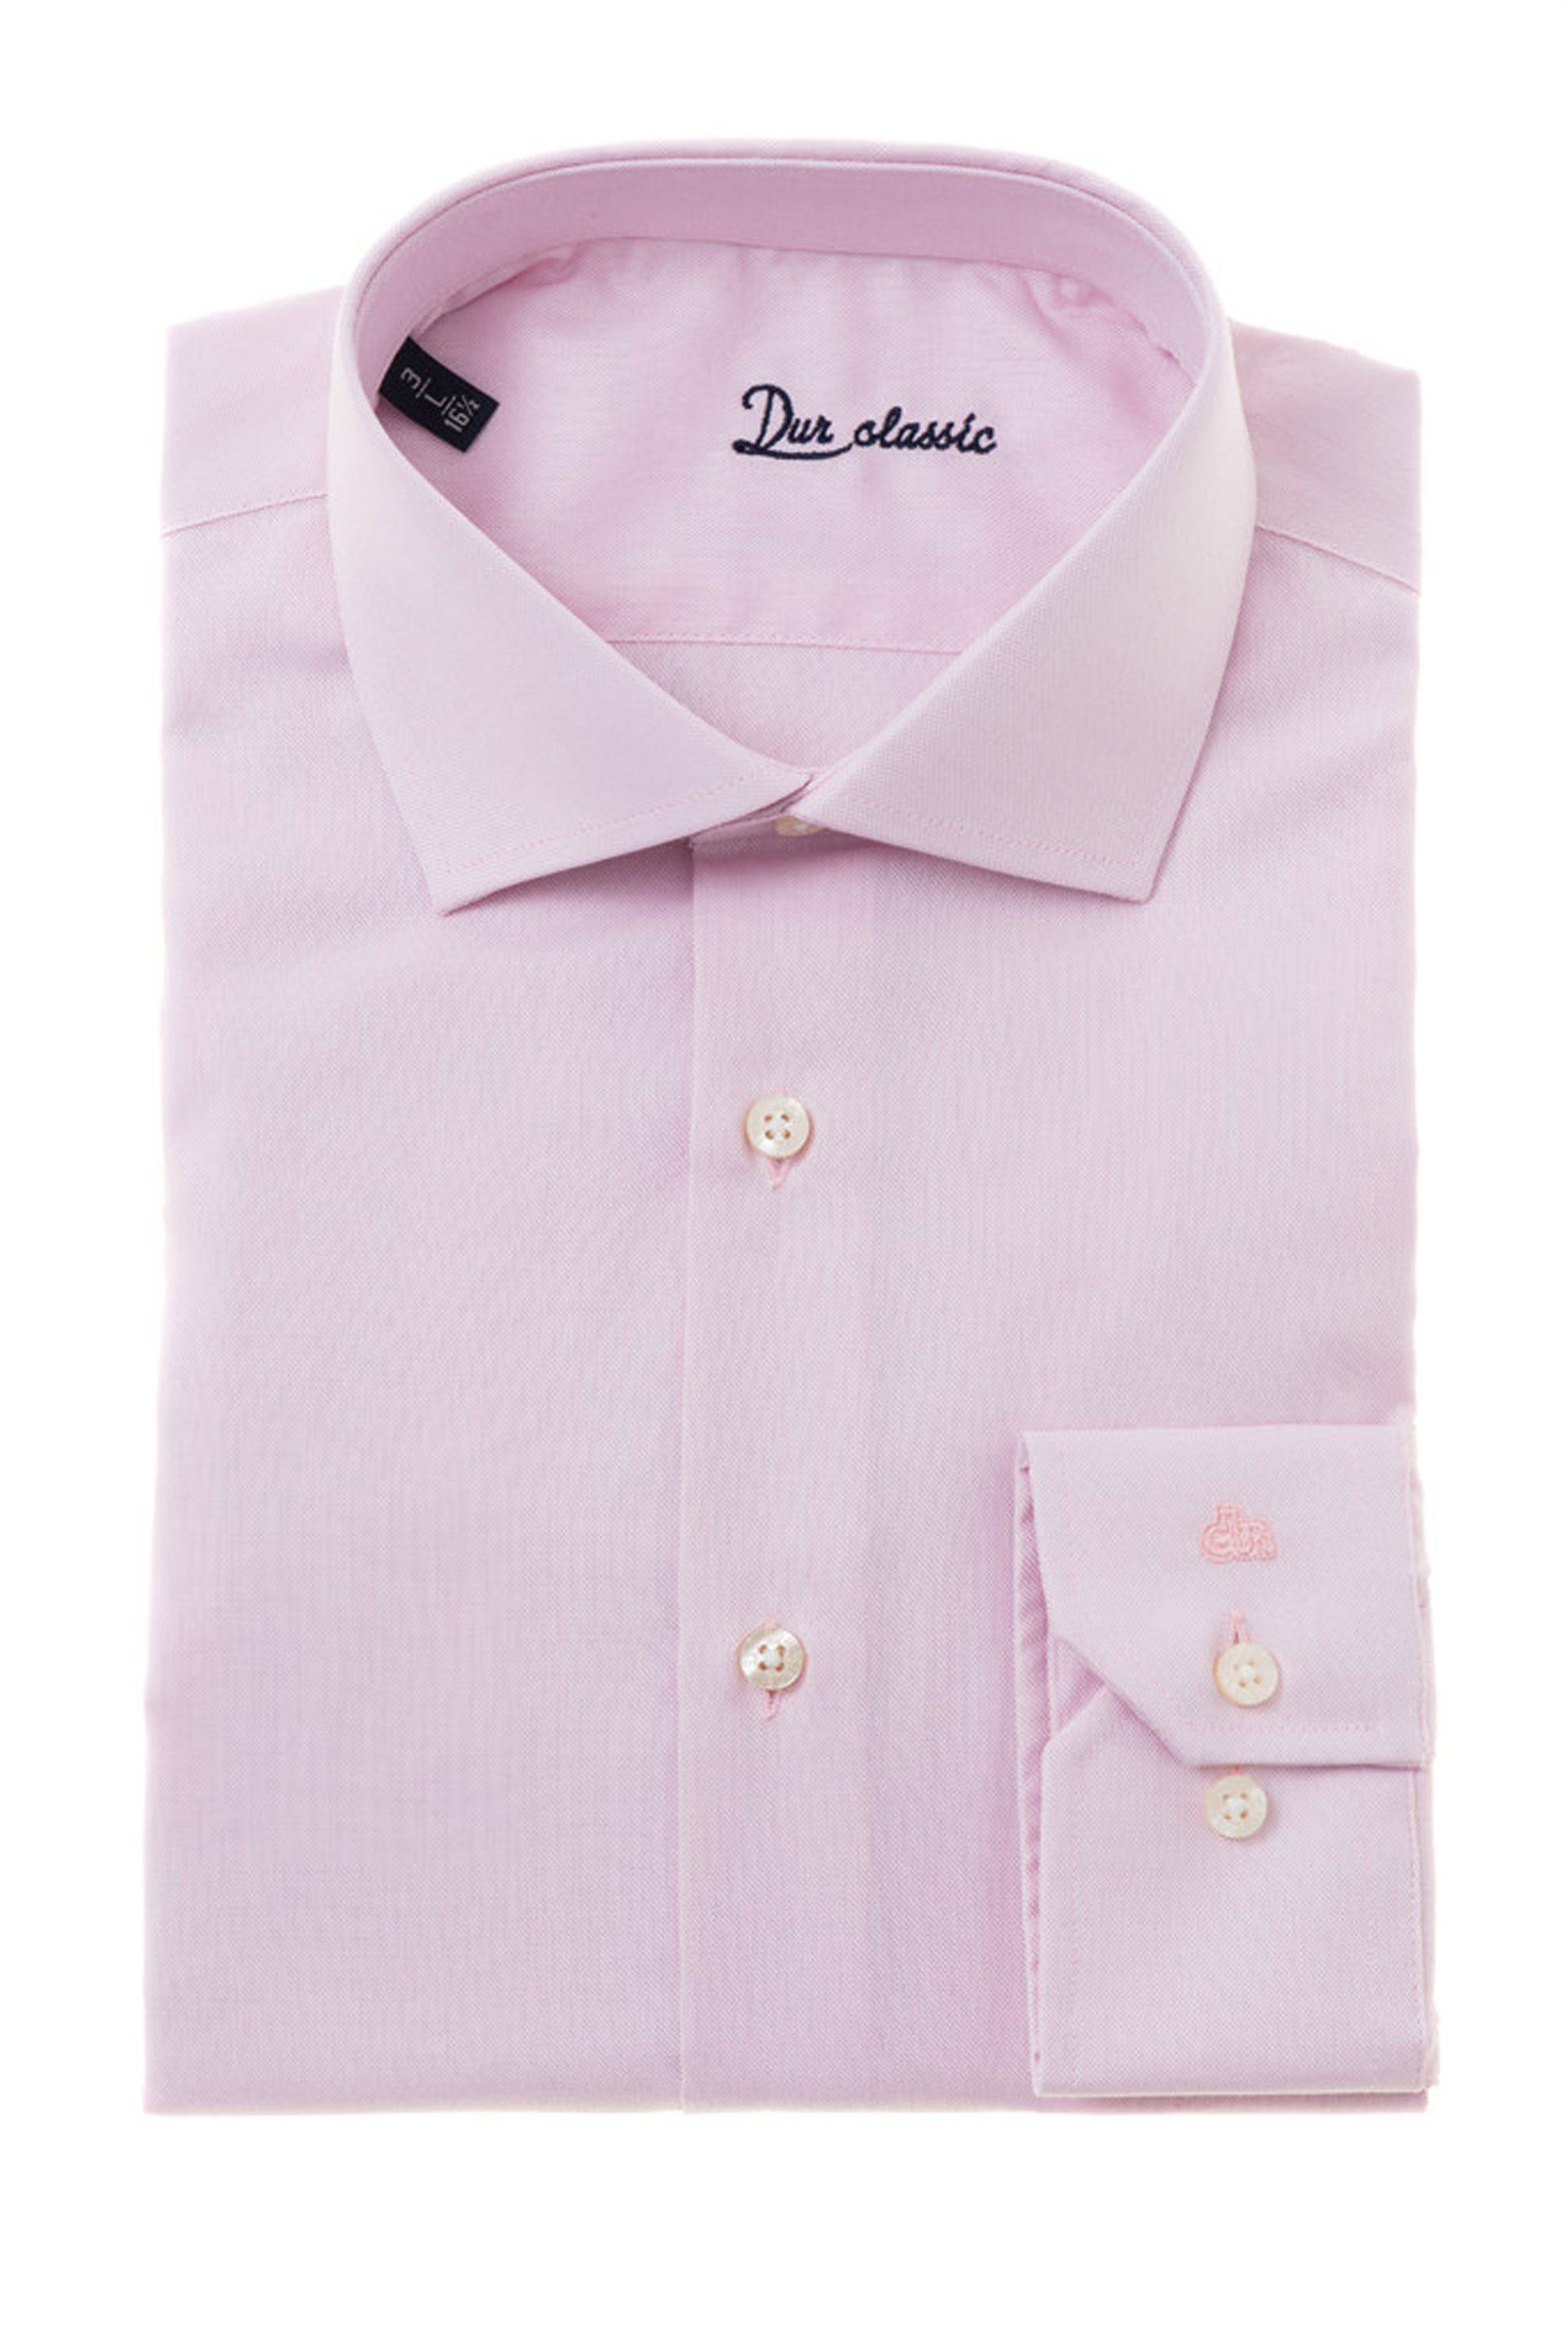 00cb2f649196 Dur ανδρικό πουκάμισο Oxford - 10000046 - Ροζ